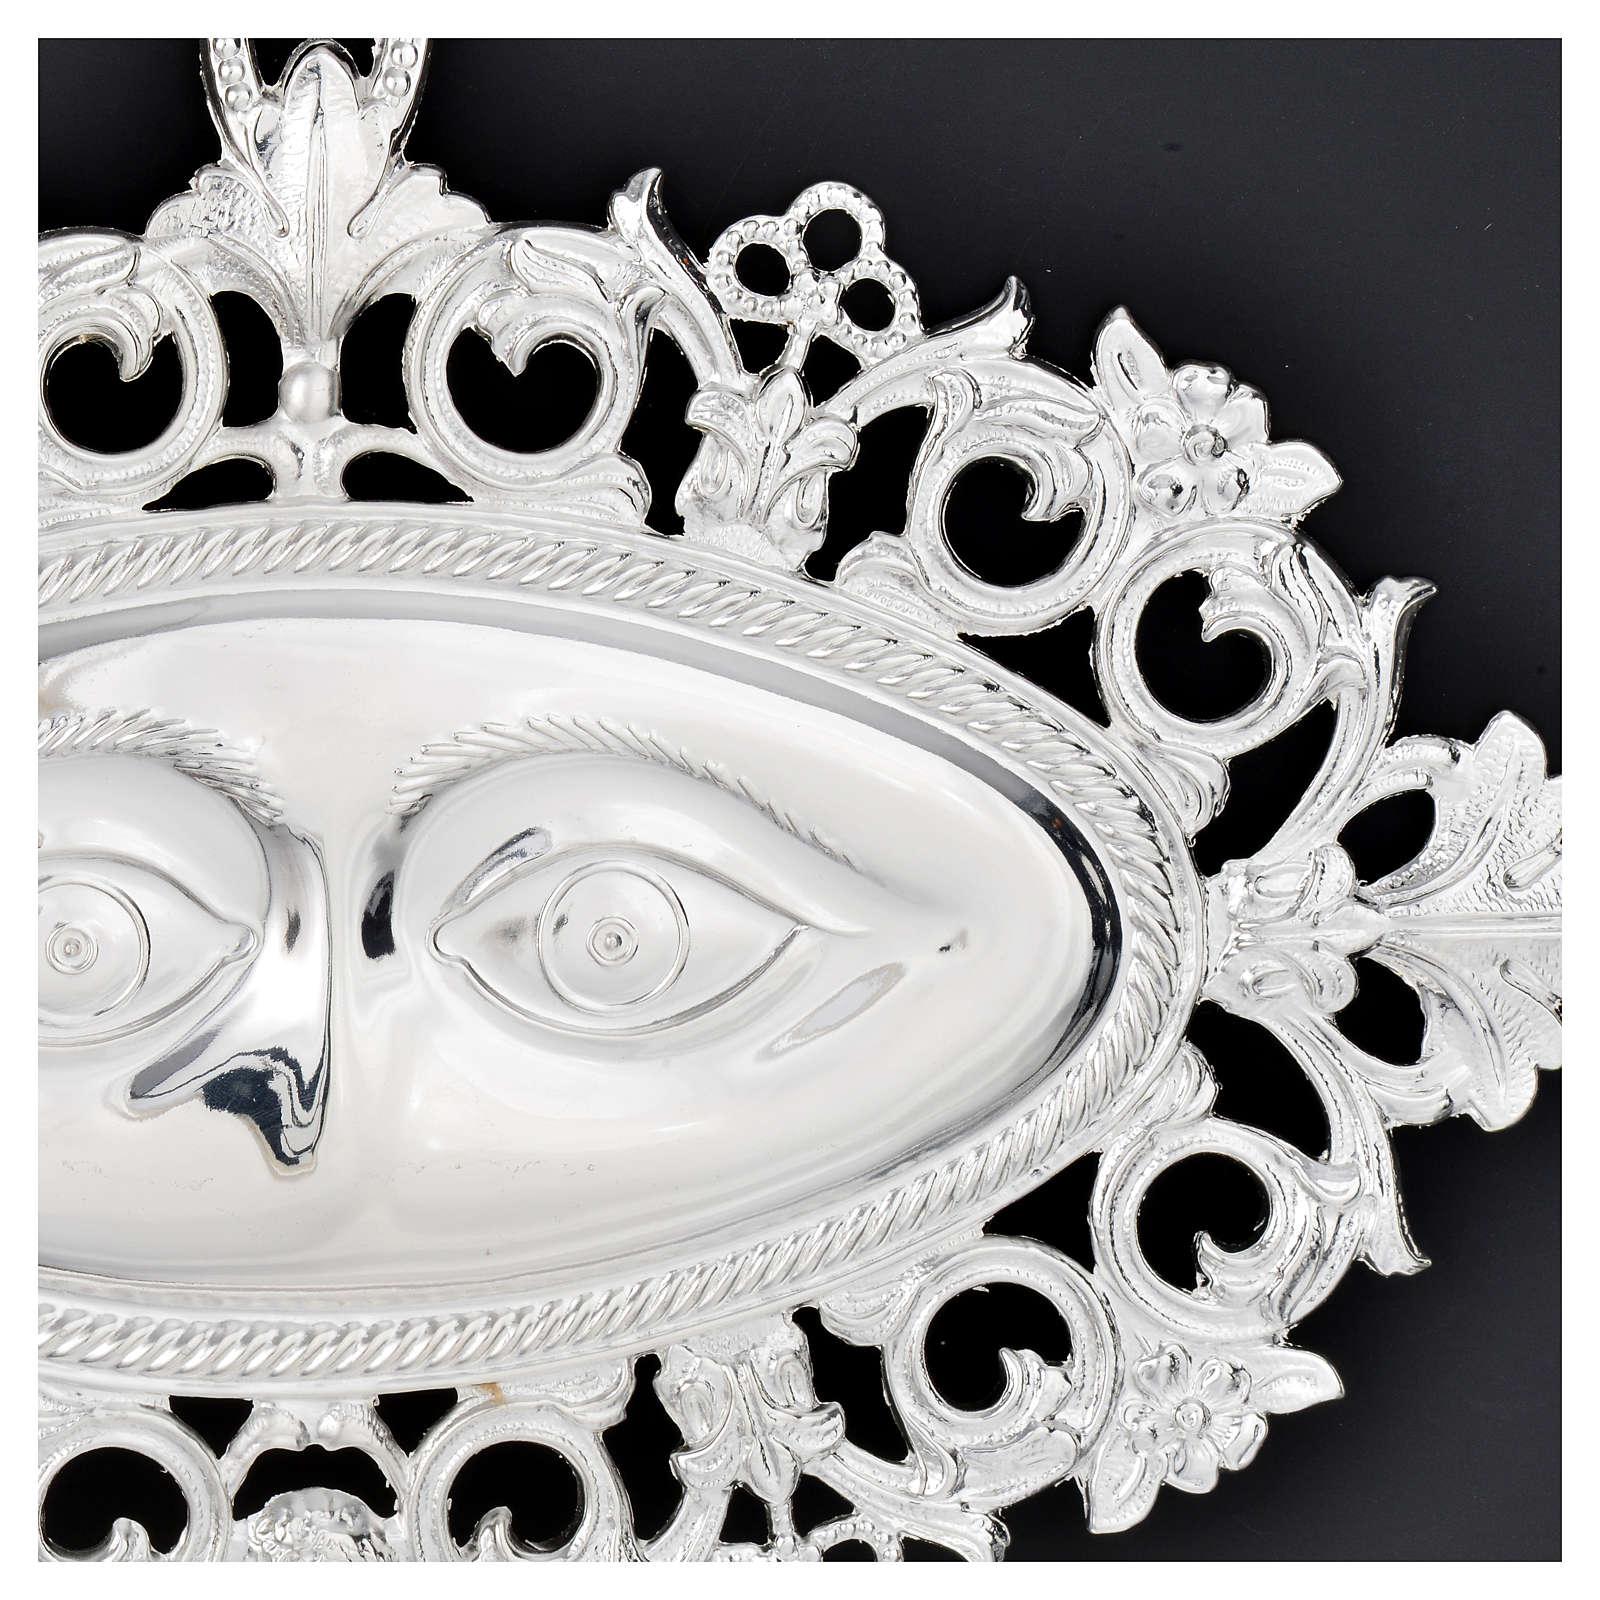 Ex voto occhi traforati argento 925 o metallo 19x11 cm 3